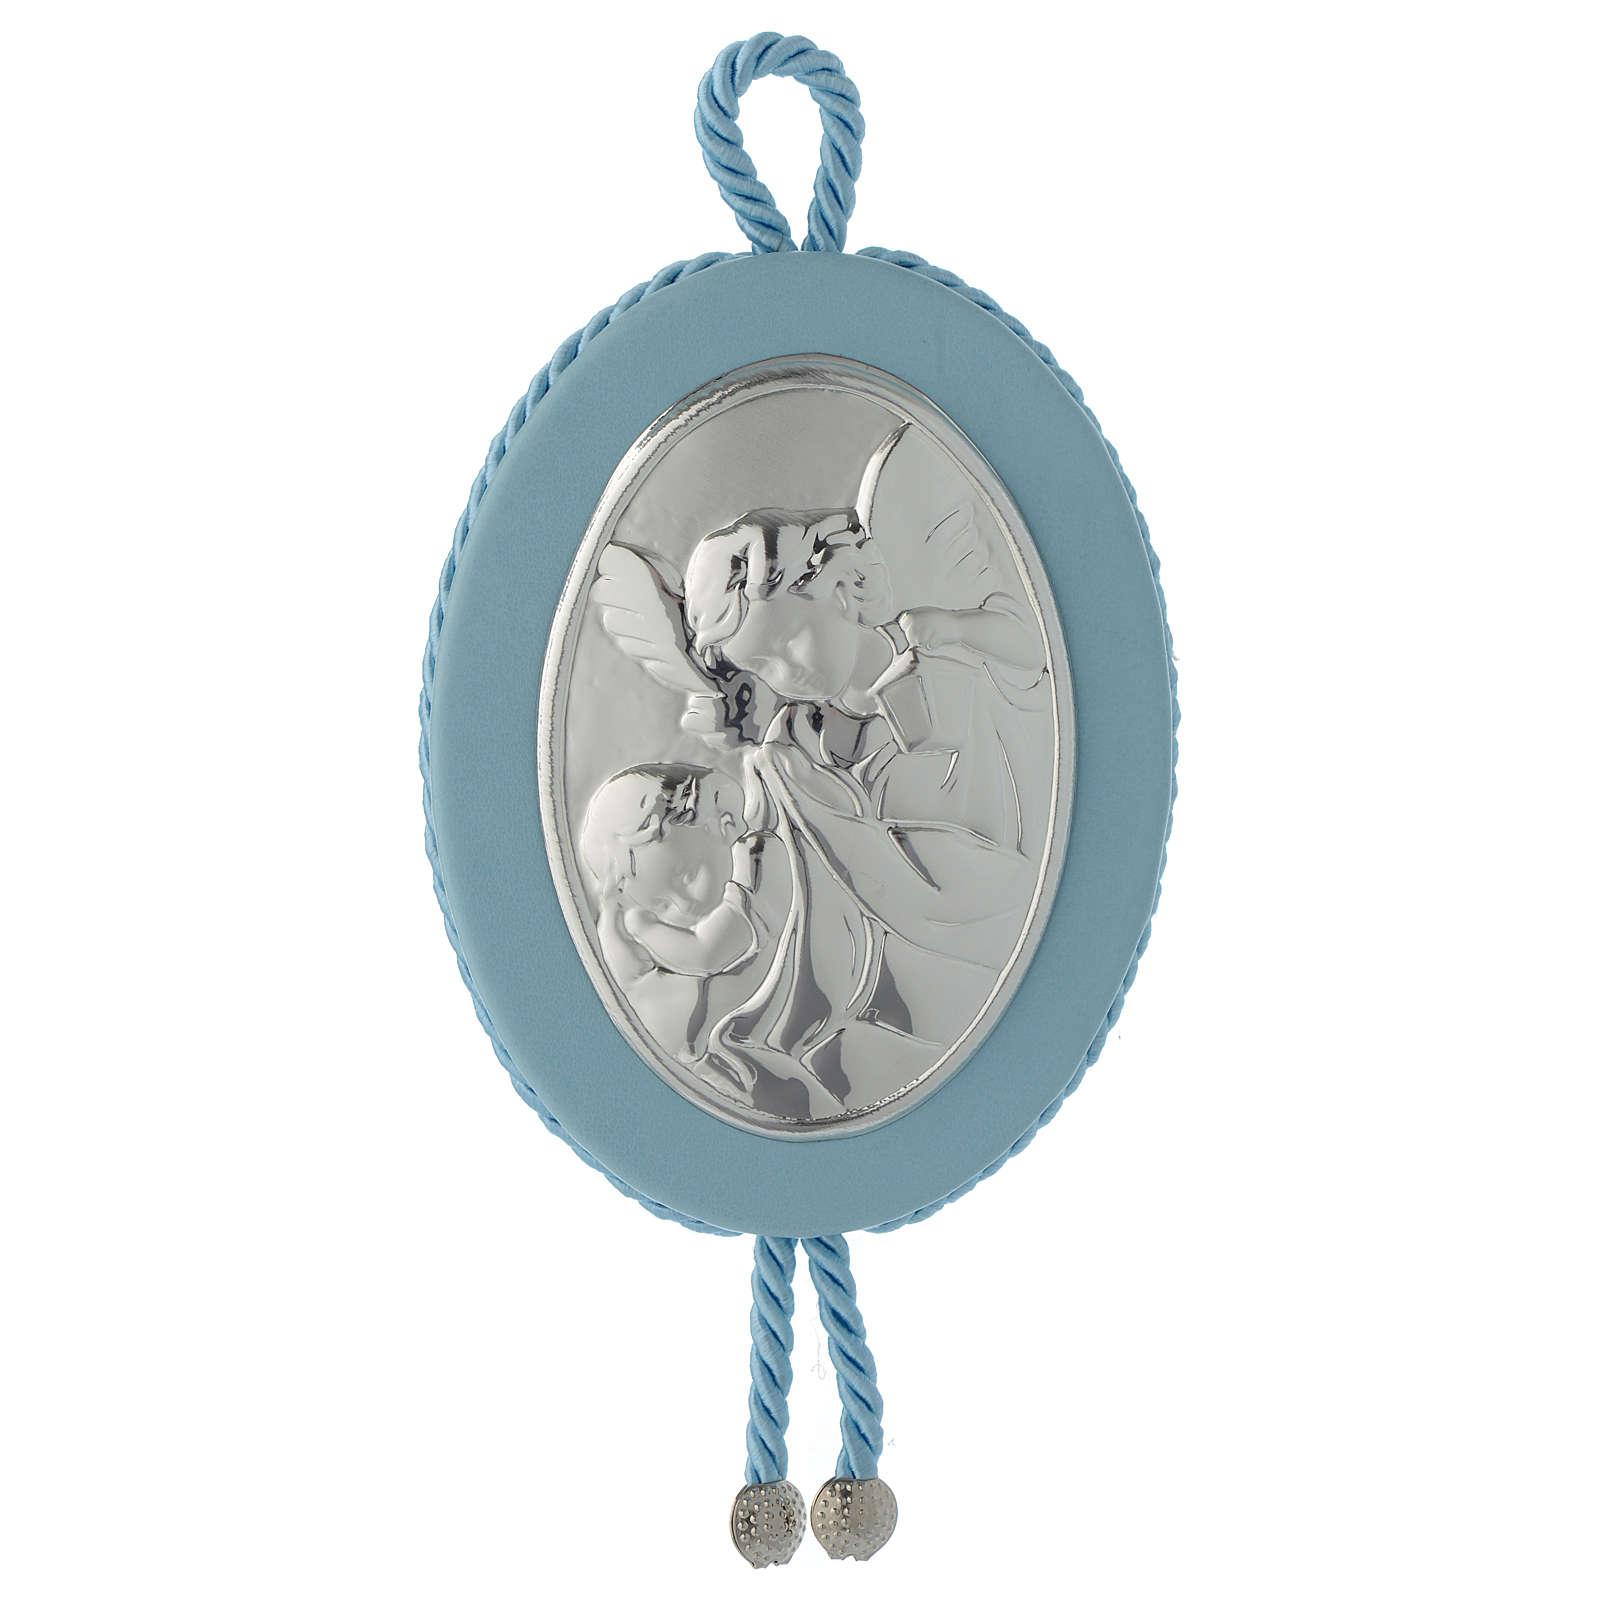 Sopraculla azzurro Angelo Custode carillon 4